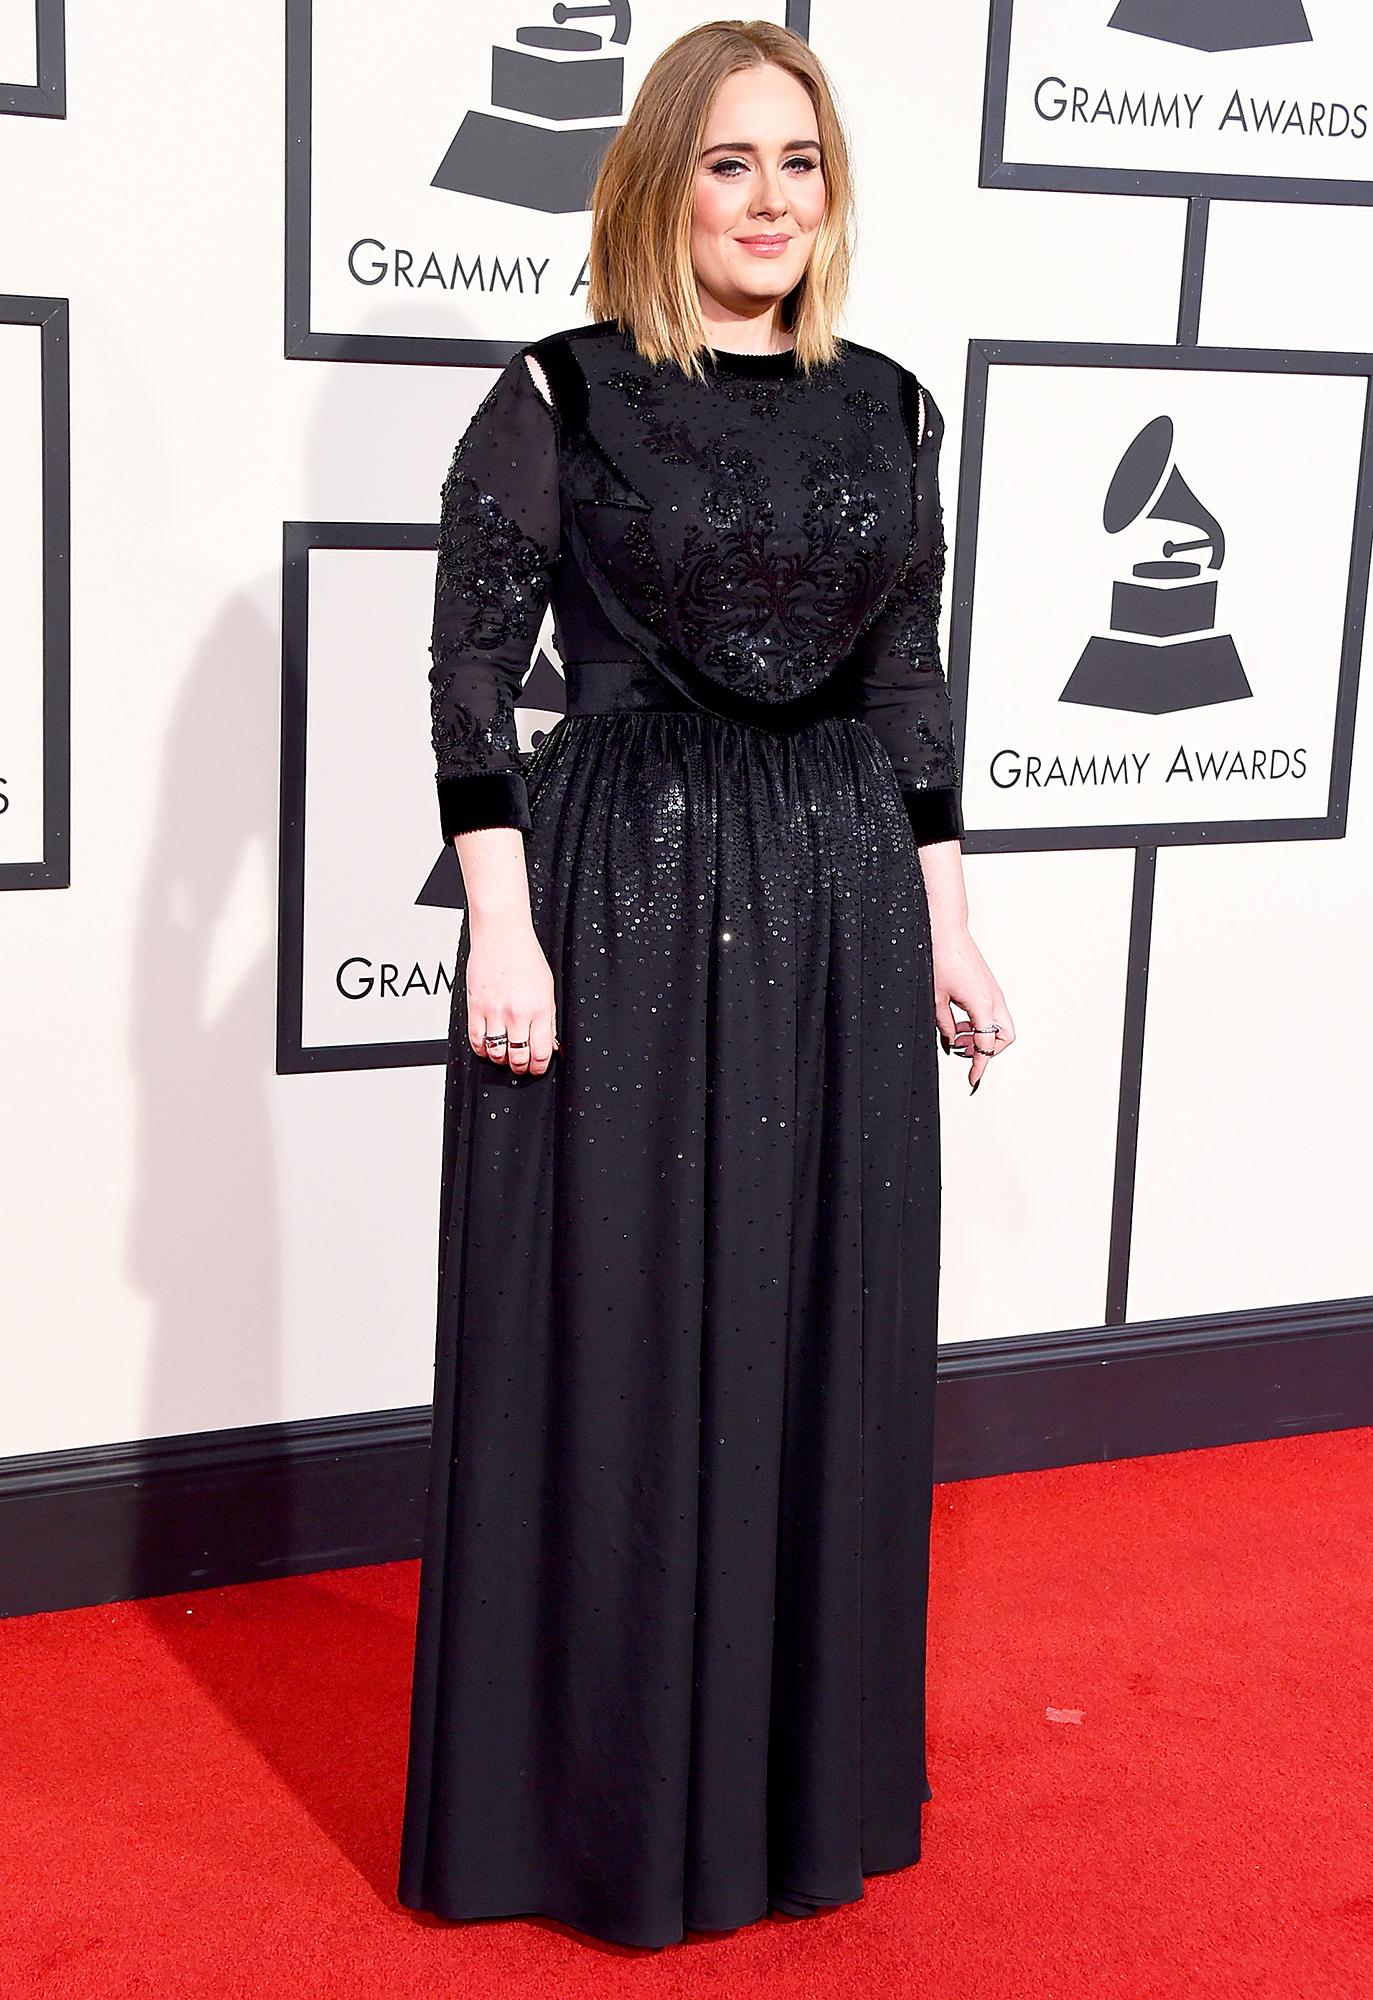 Grammys 2016 Adele Looks Slim Stunning At First Awards